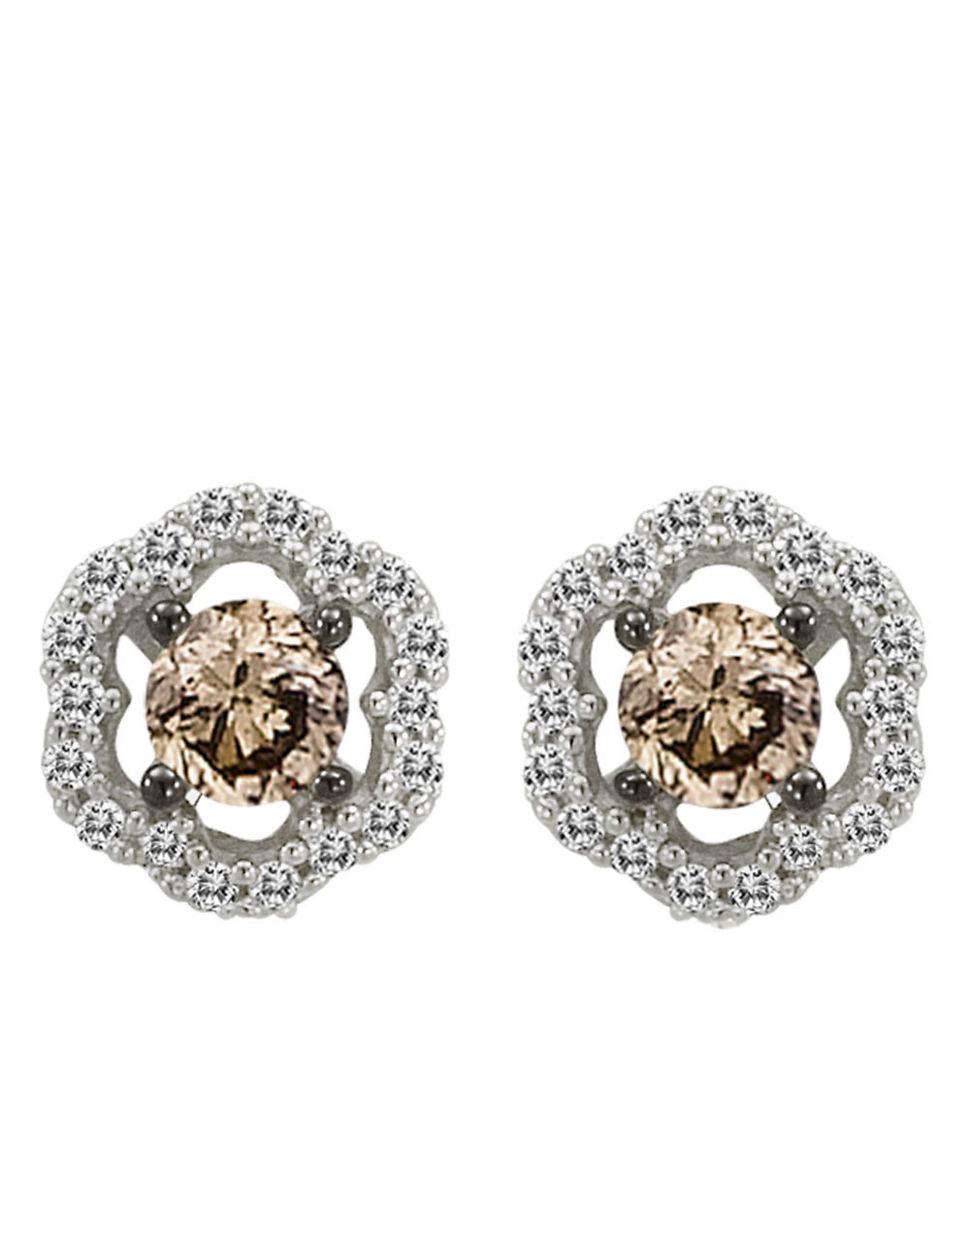 Lyst Le Vian Chocolate Diamond Stud Earrings In 14k White